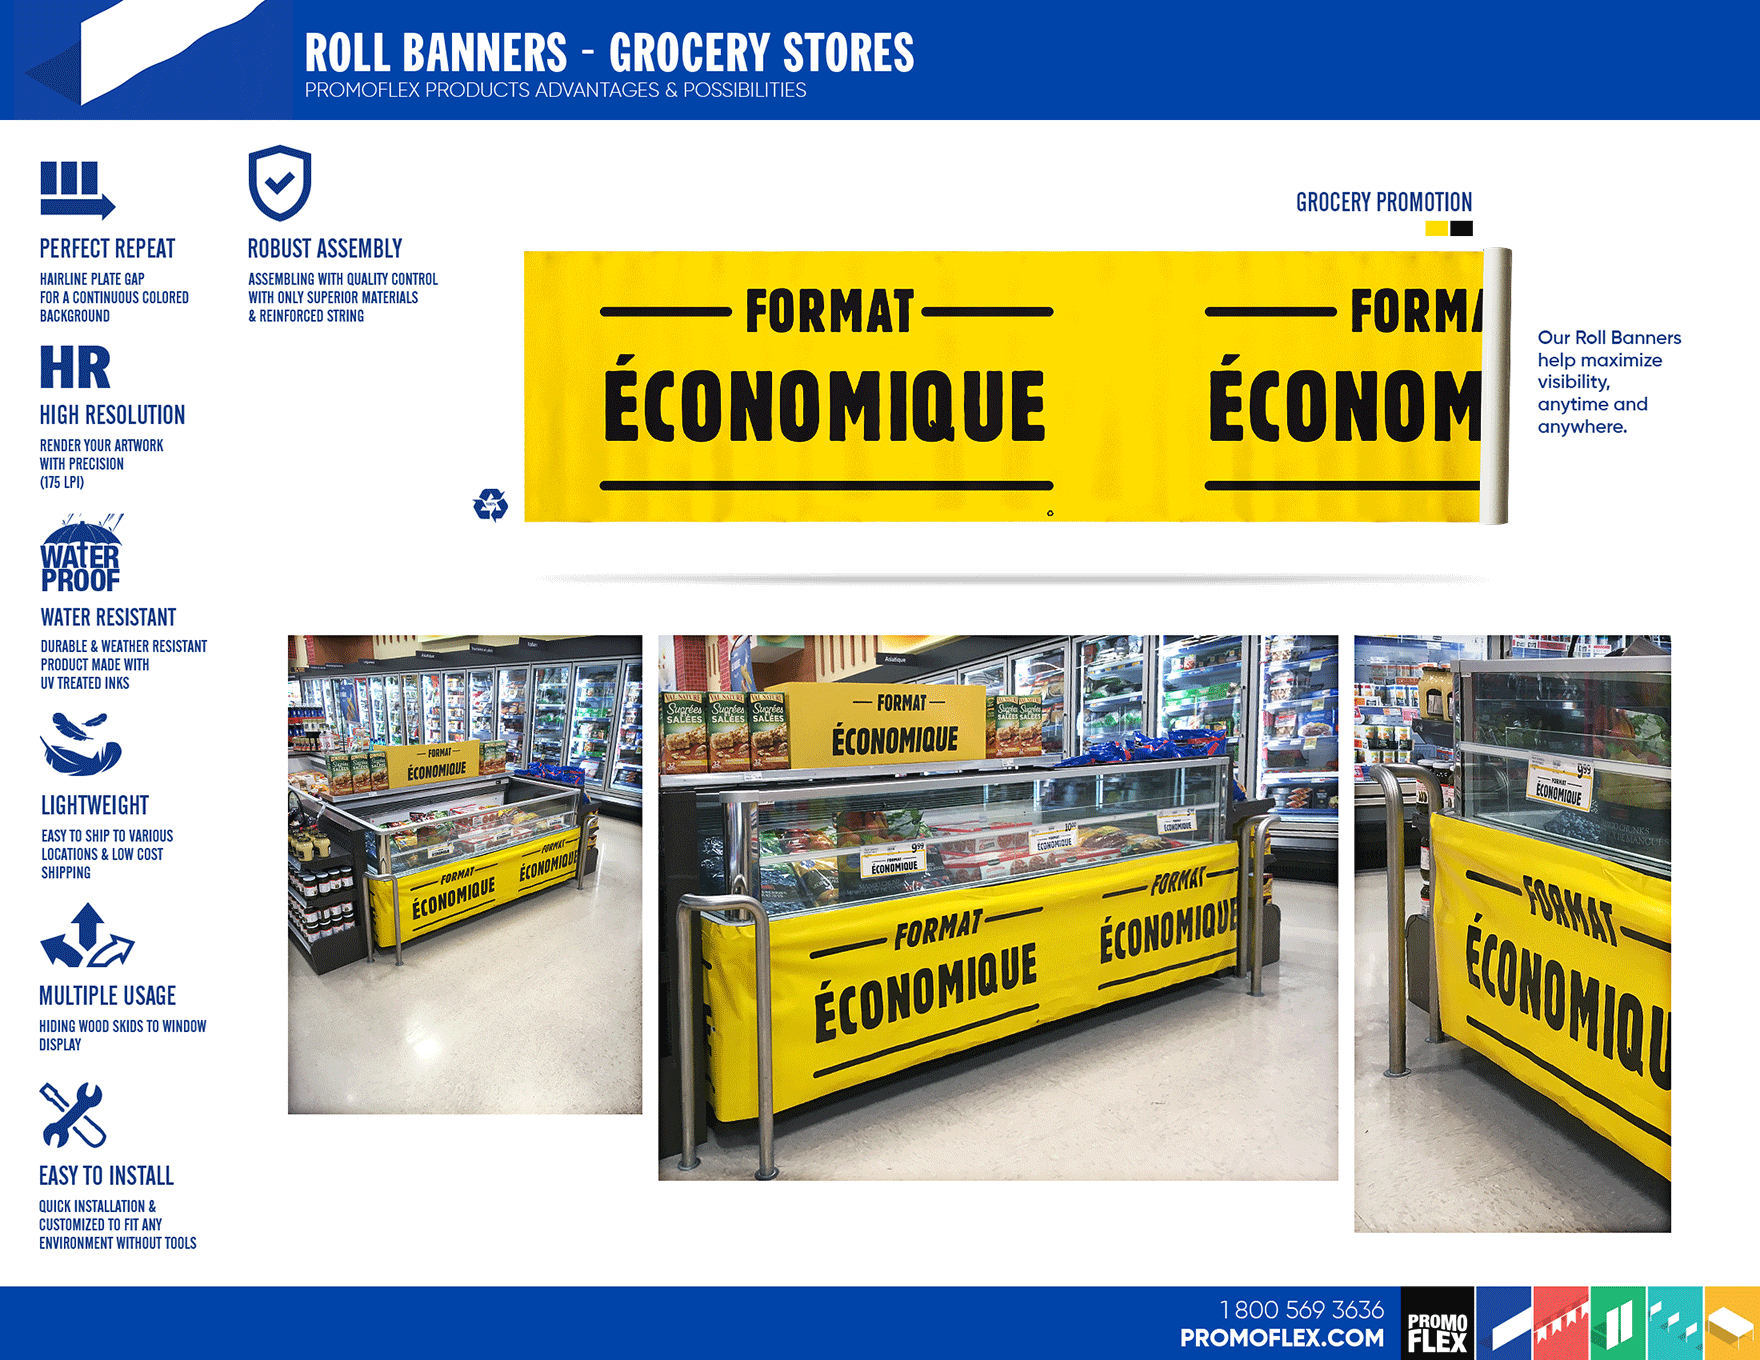 roll-banners-grocery-stores-en-9n.png (564 KB)